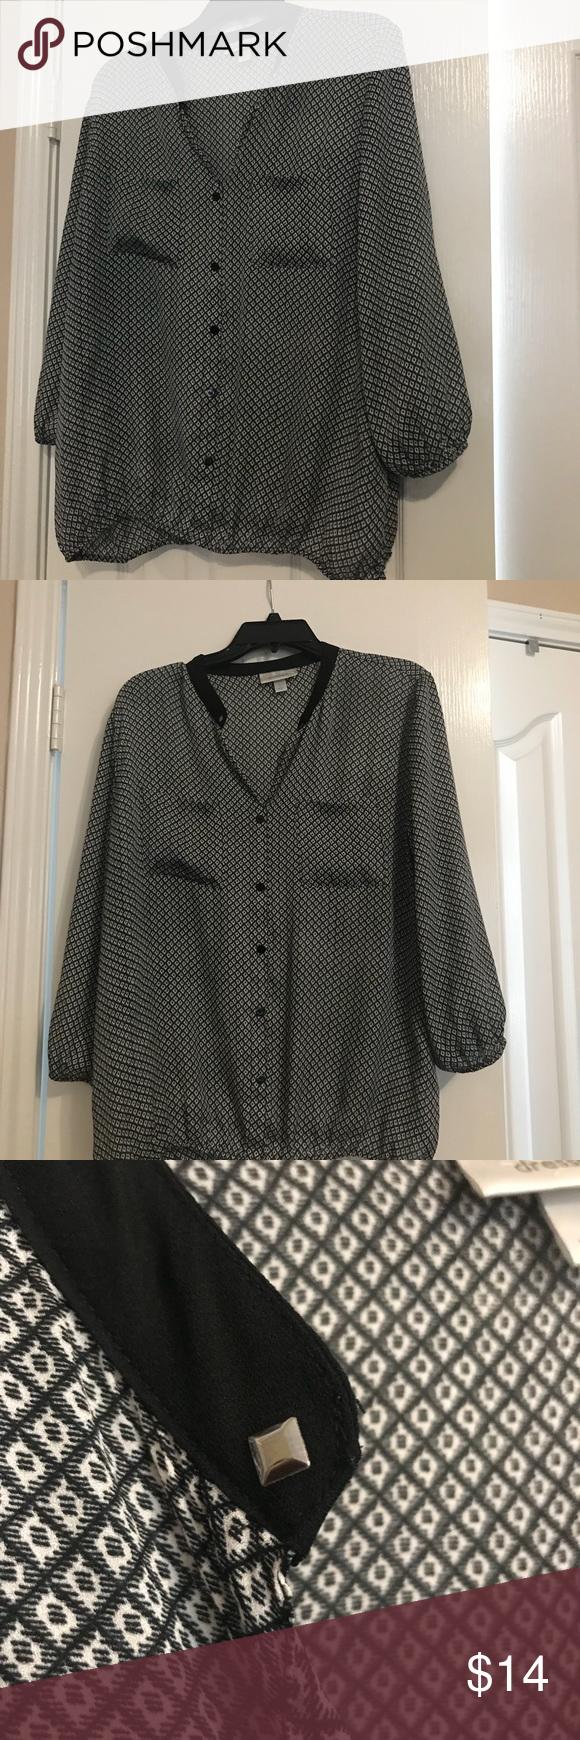 Dress Barn Black And White Top In 2018 My Posh Closet Pinterest